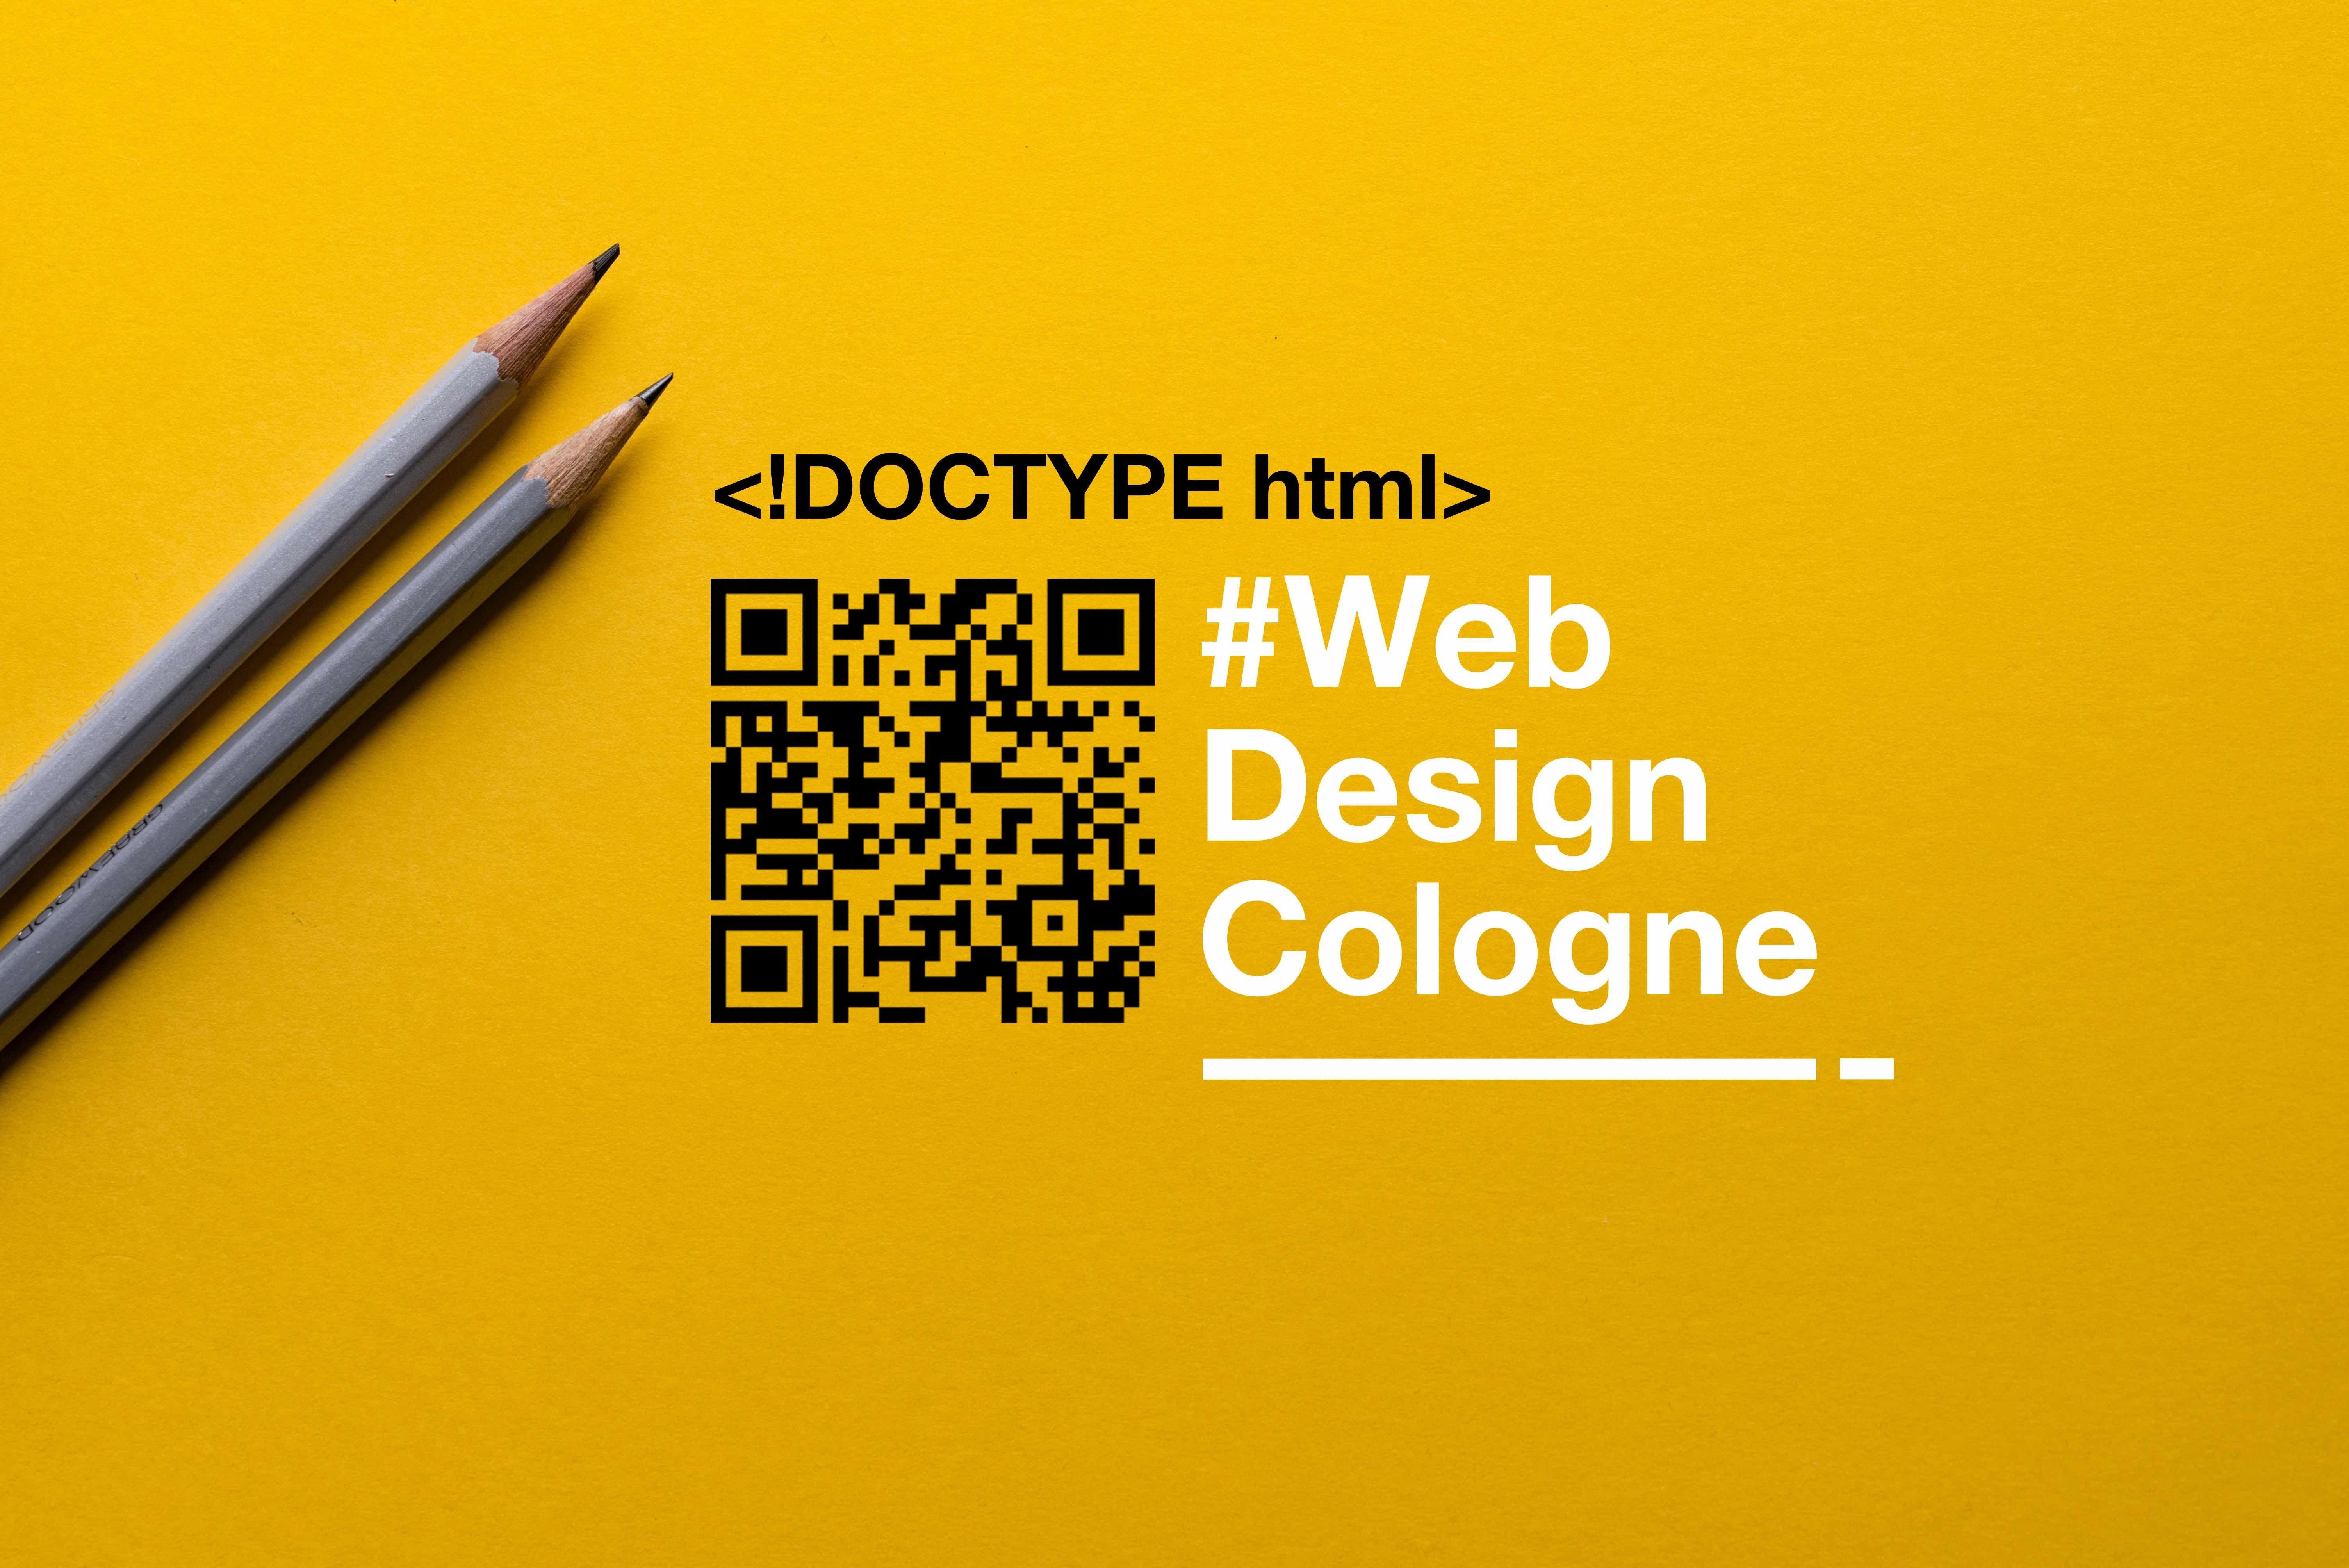 Webdesign Cologne #WDCGN